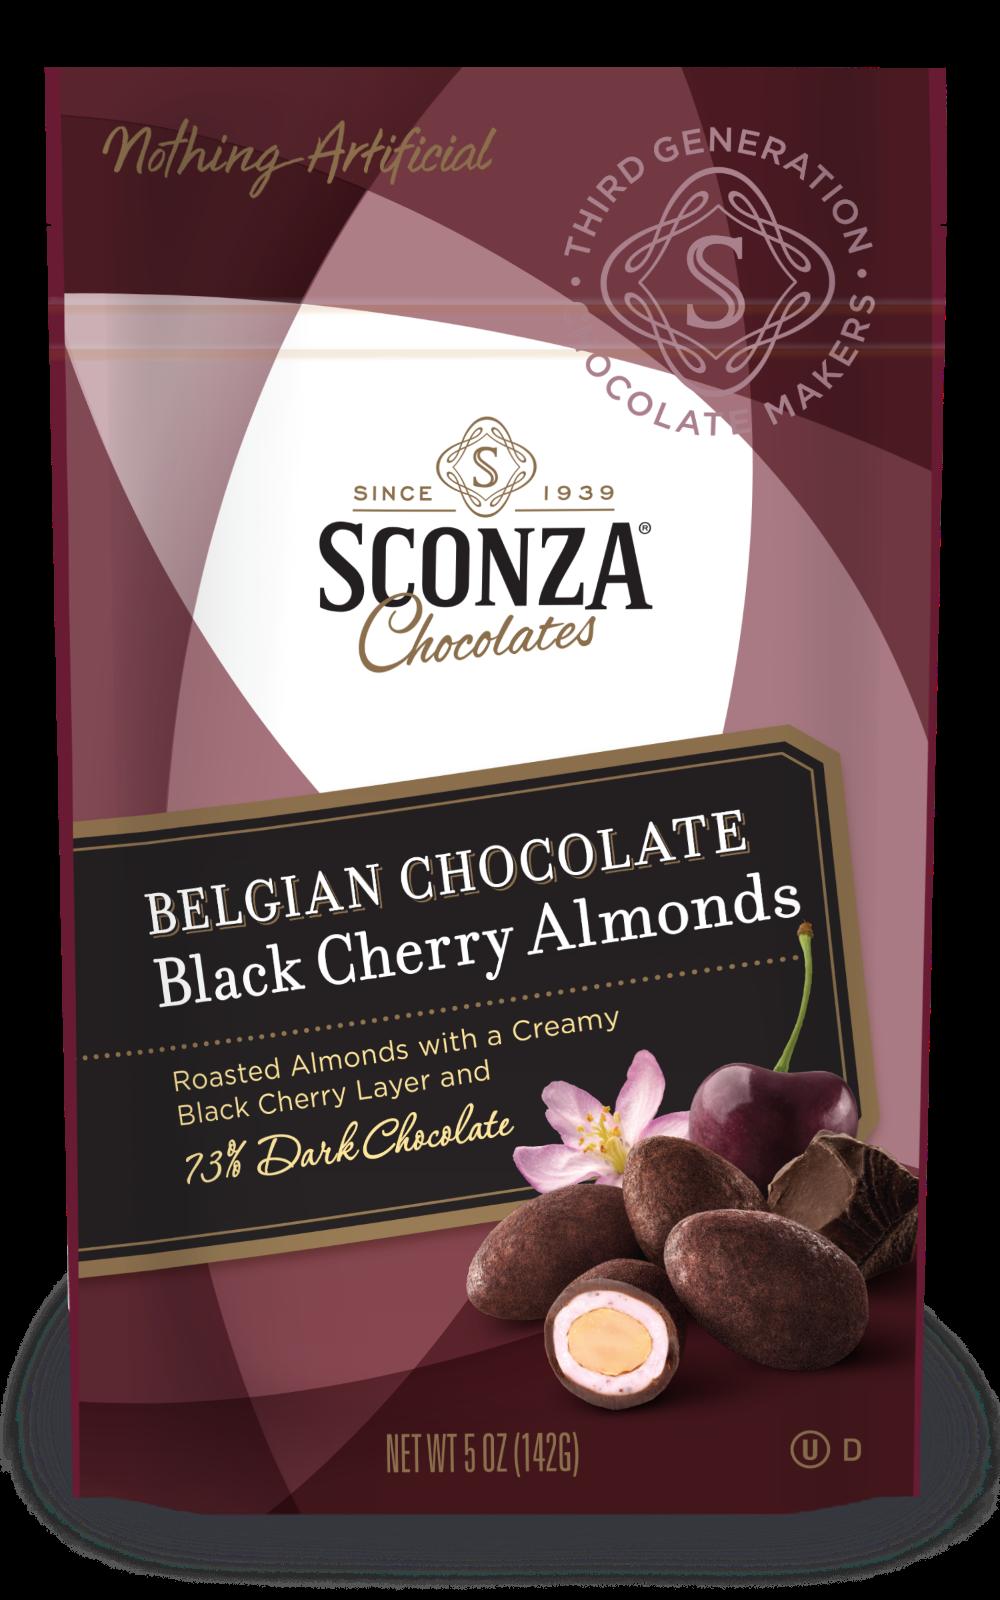 Belgian Chocolate Black Cherry Almonds